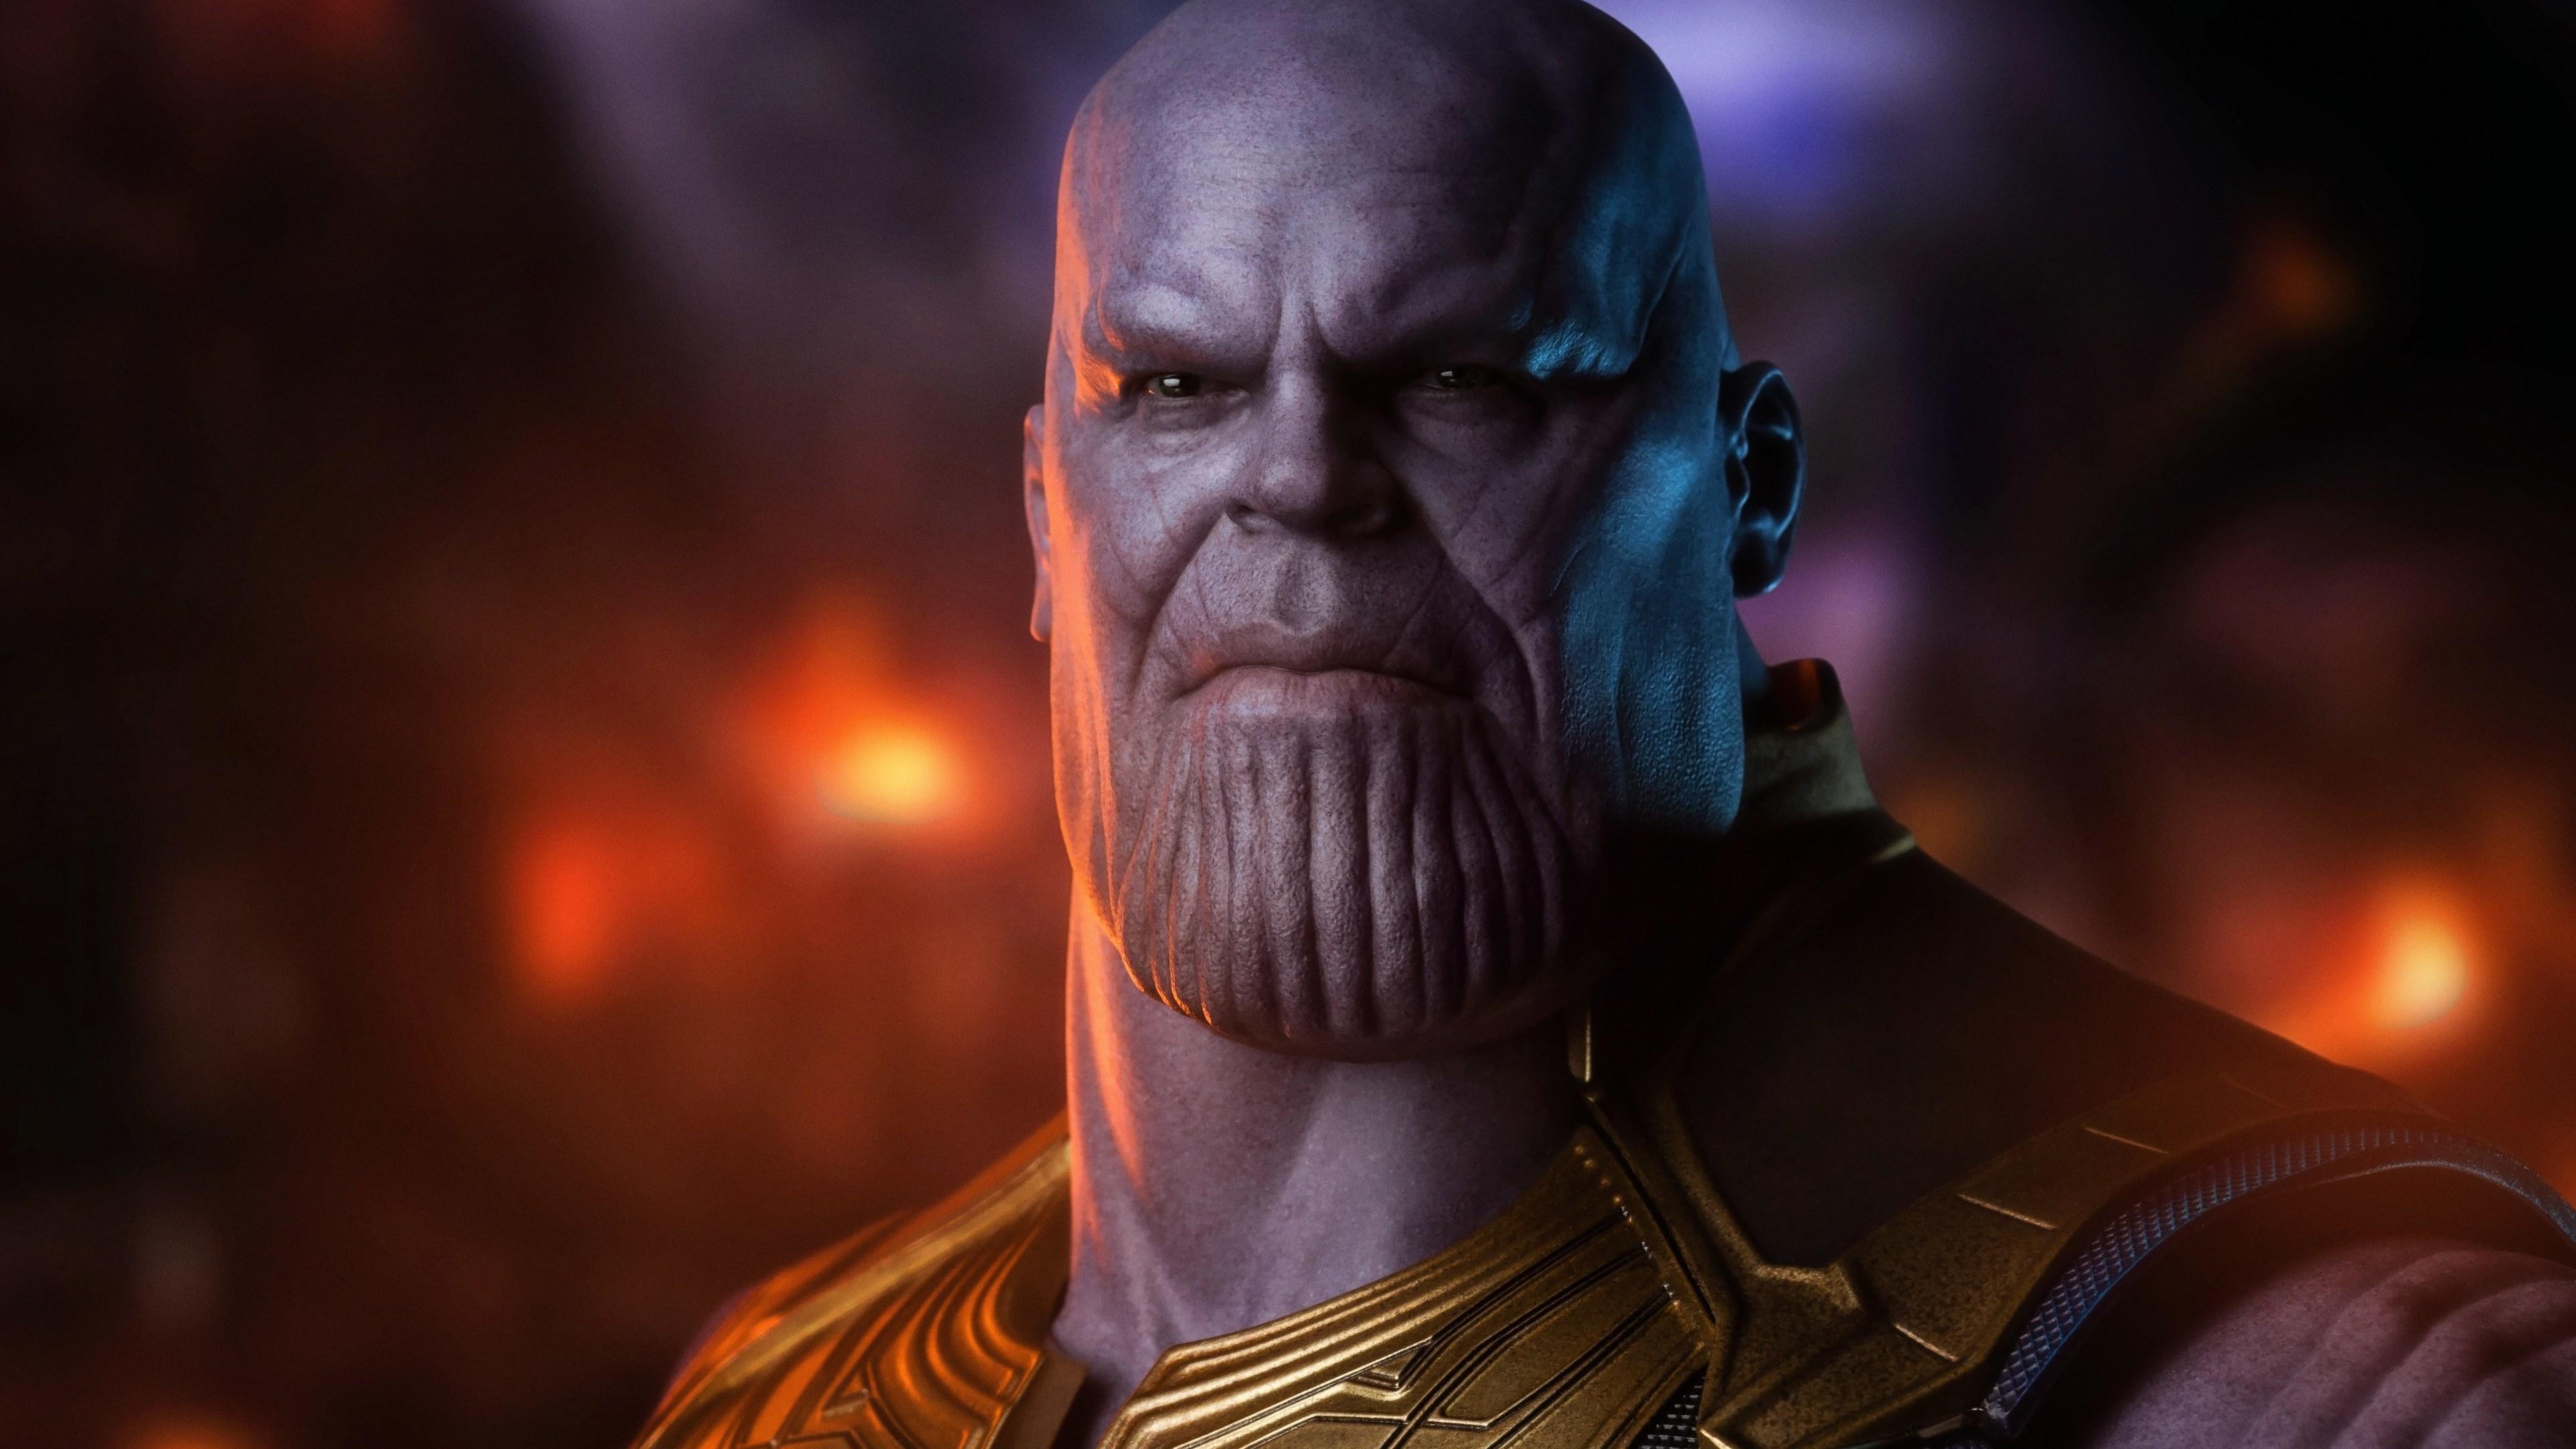 thanos 2019 1563220396 - Thanos 2019 - thanos-wallpapers, supervillain wallpapers, superheroes wallpapers, hd-wallpapers, 5k wallpapers, 4k-wallpapers